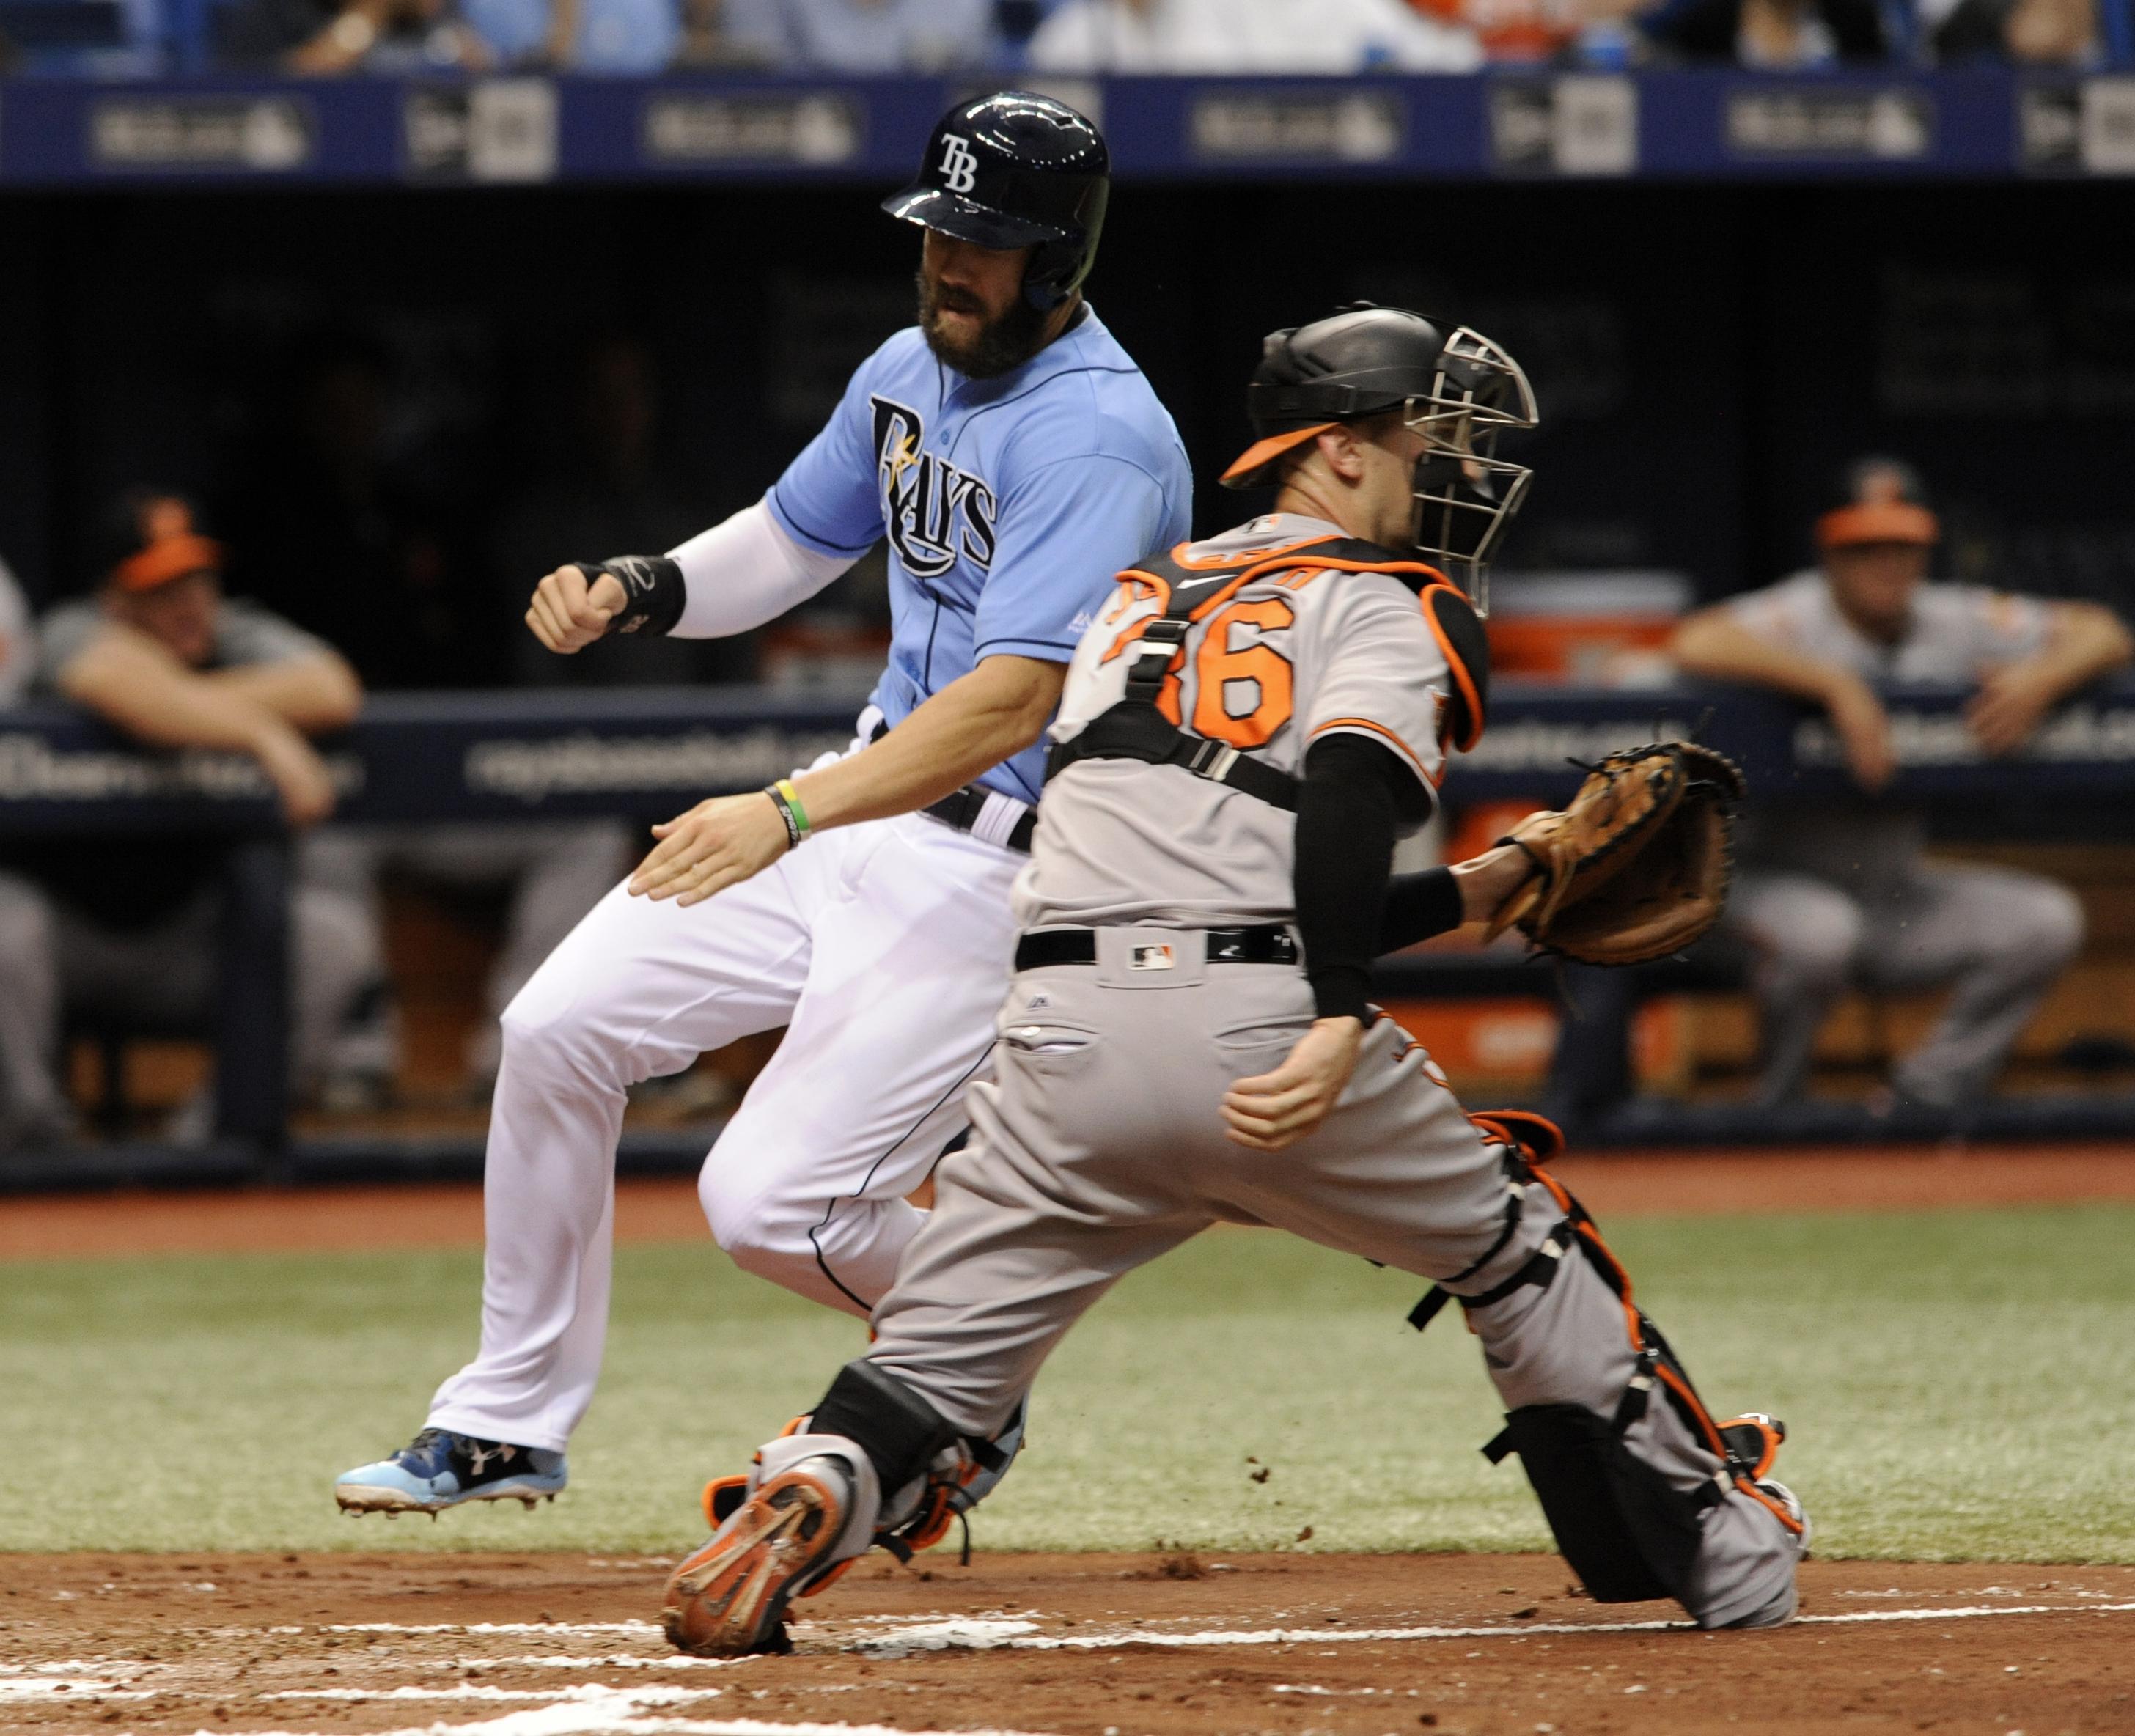 Orioles_rays_baseball_41432